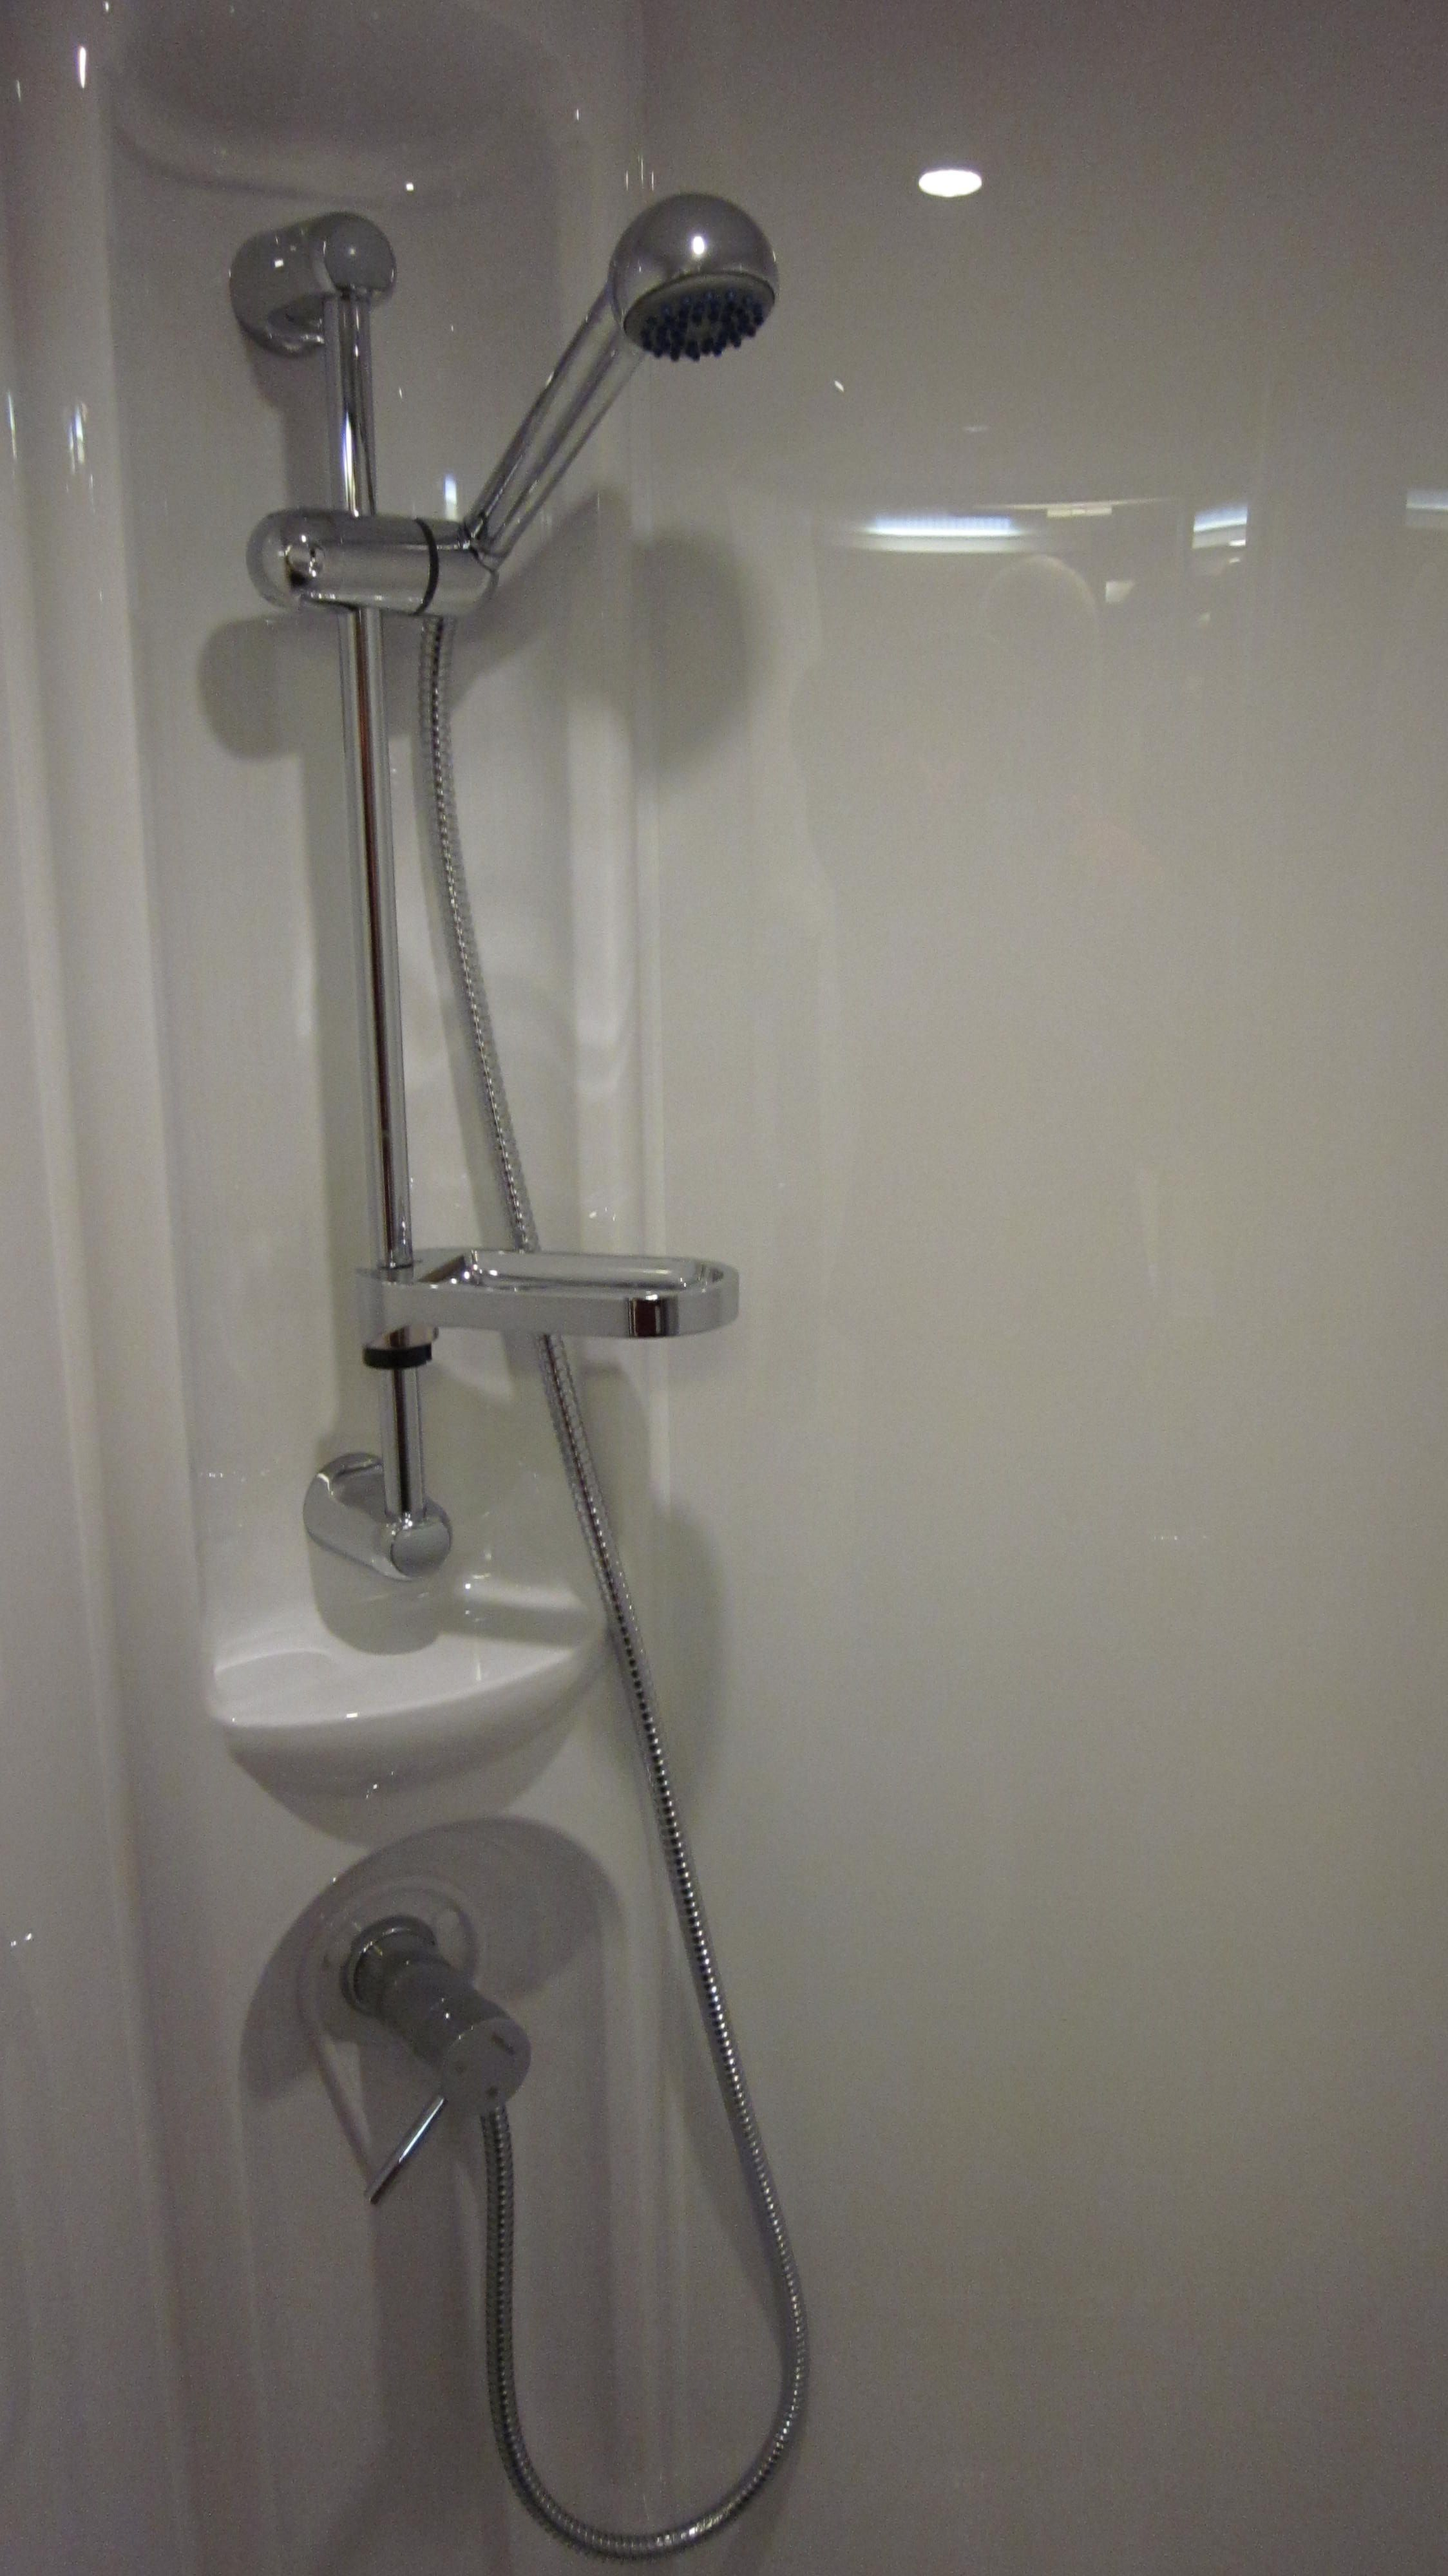 Elddis Affinity 540. Shower head in large shower cubicle. | Caravan ...